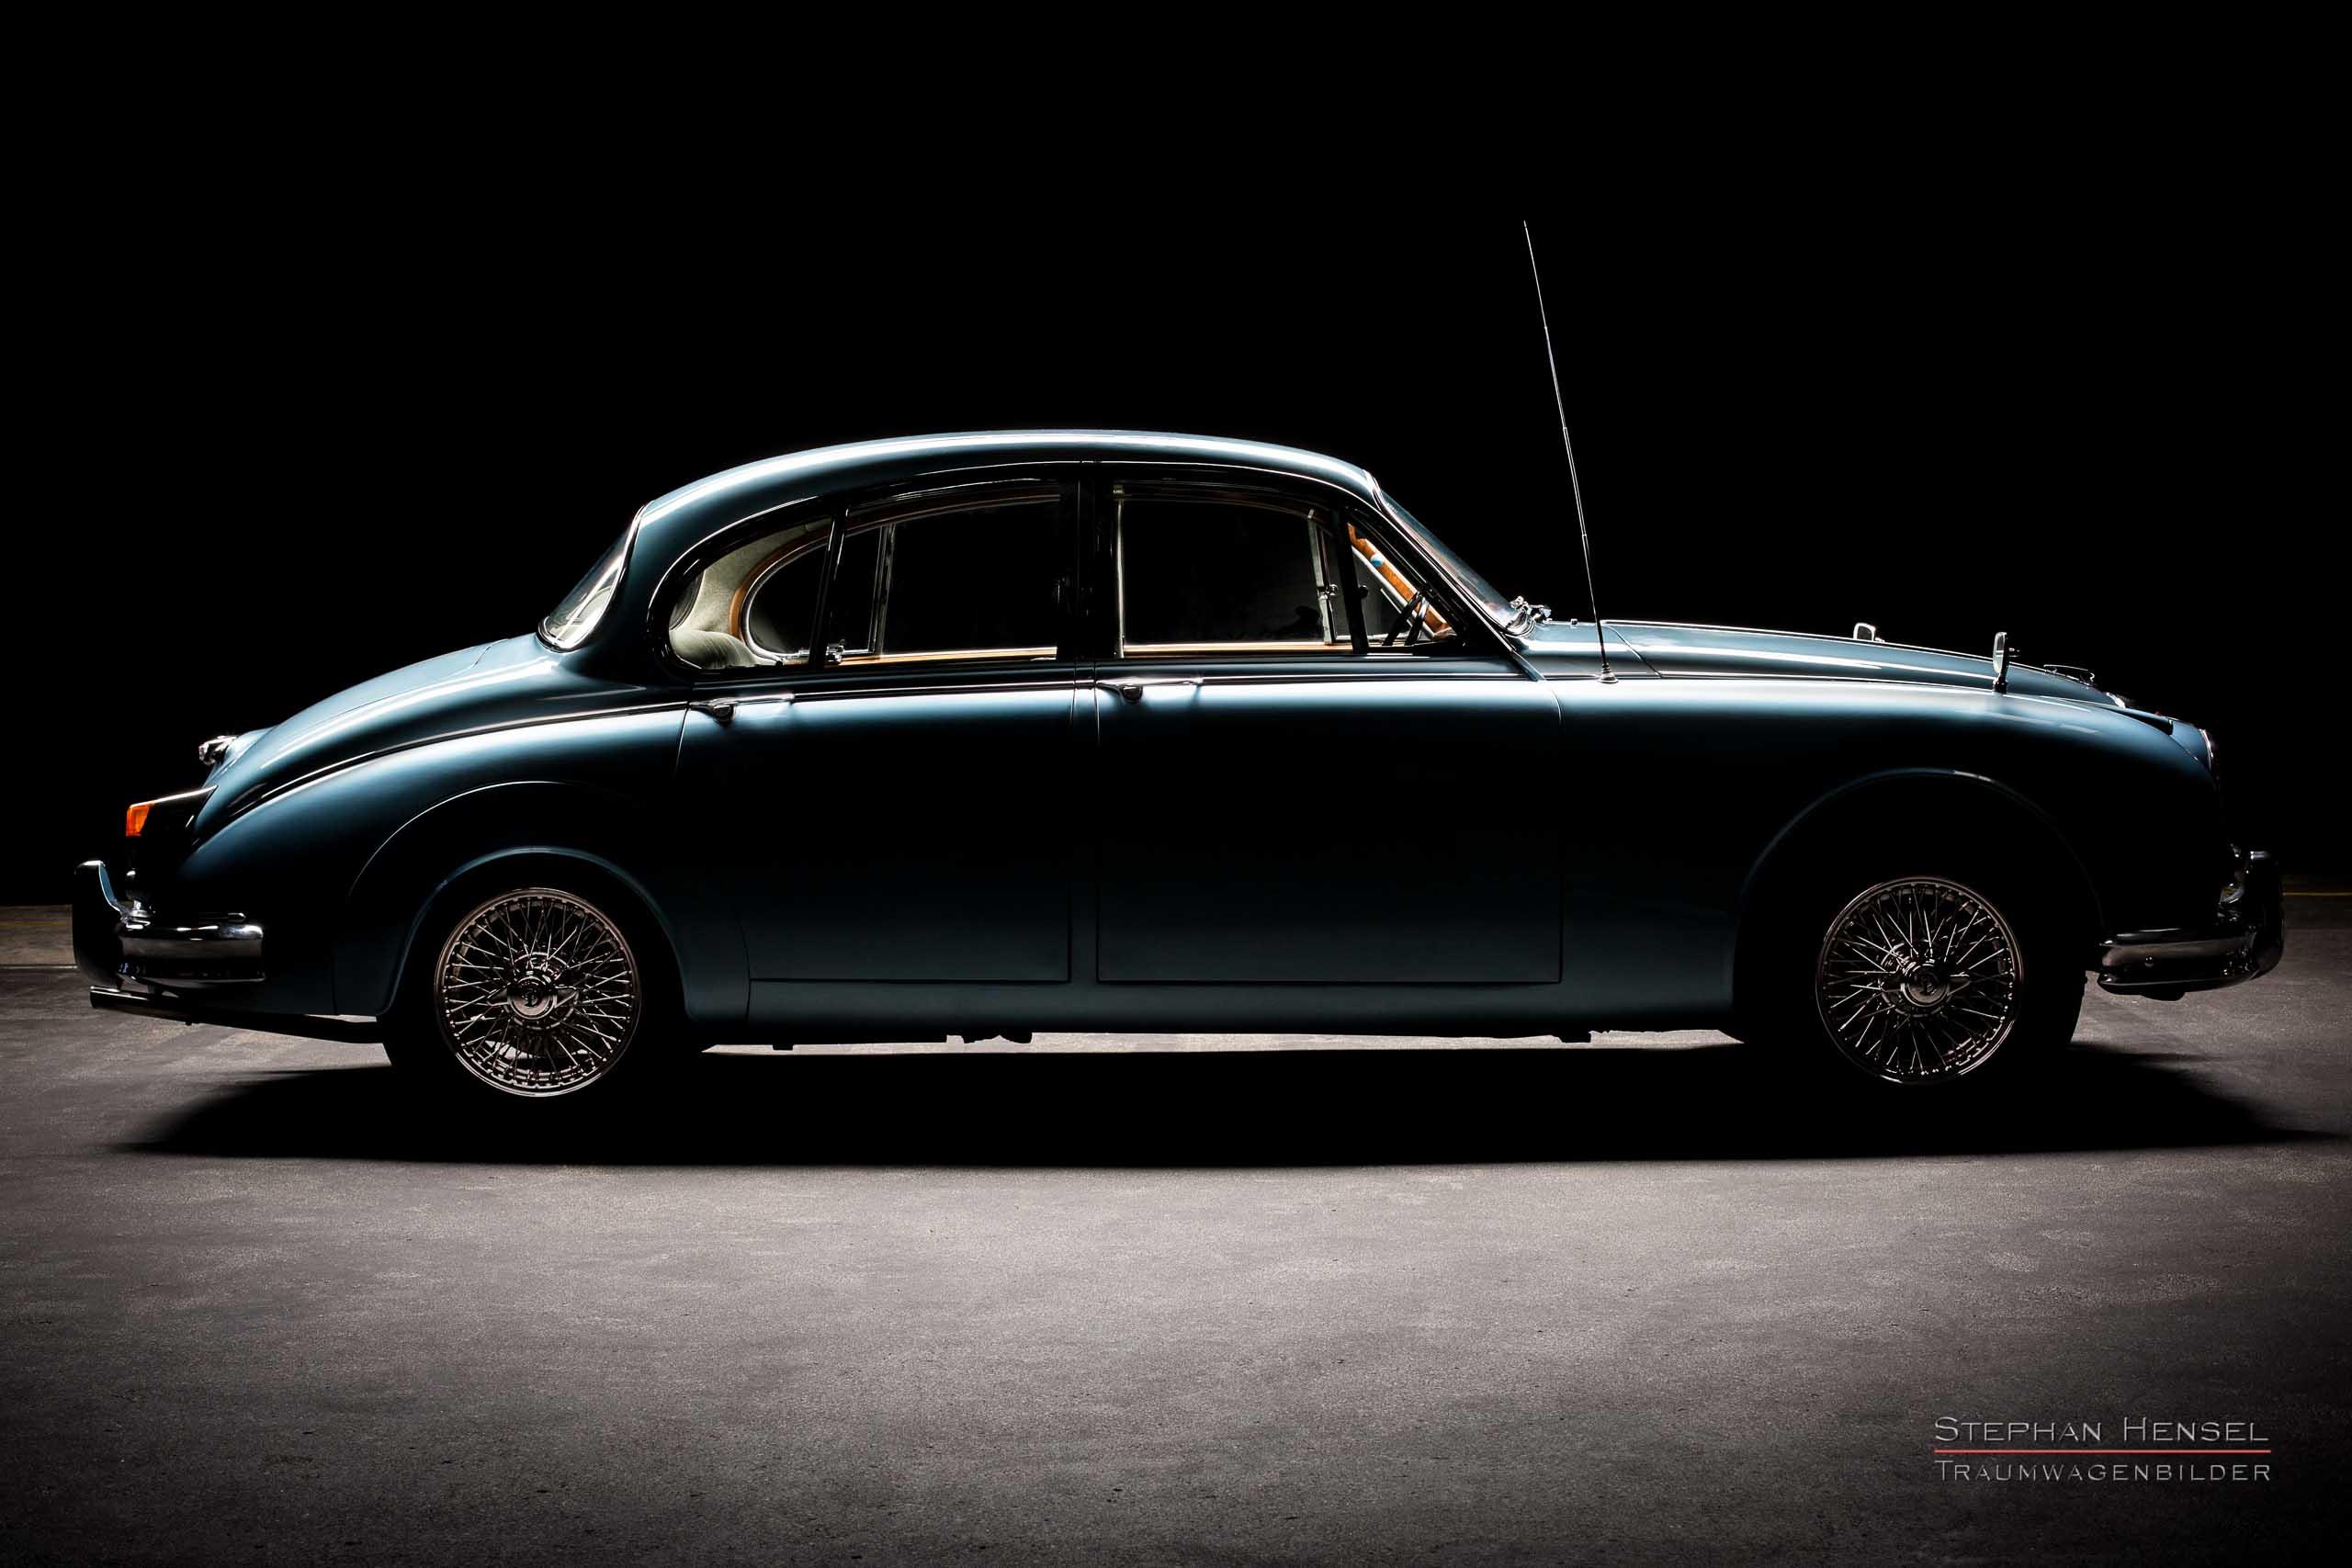 Daimler 250 V8, Seitenansicht von rechts, Autofotograf: Stephan Hensel, Oldtimerfotograf, Hamburg